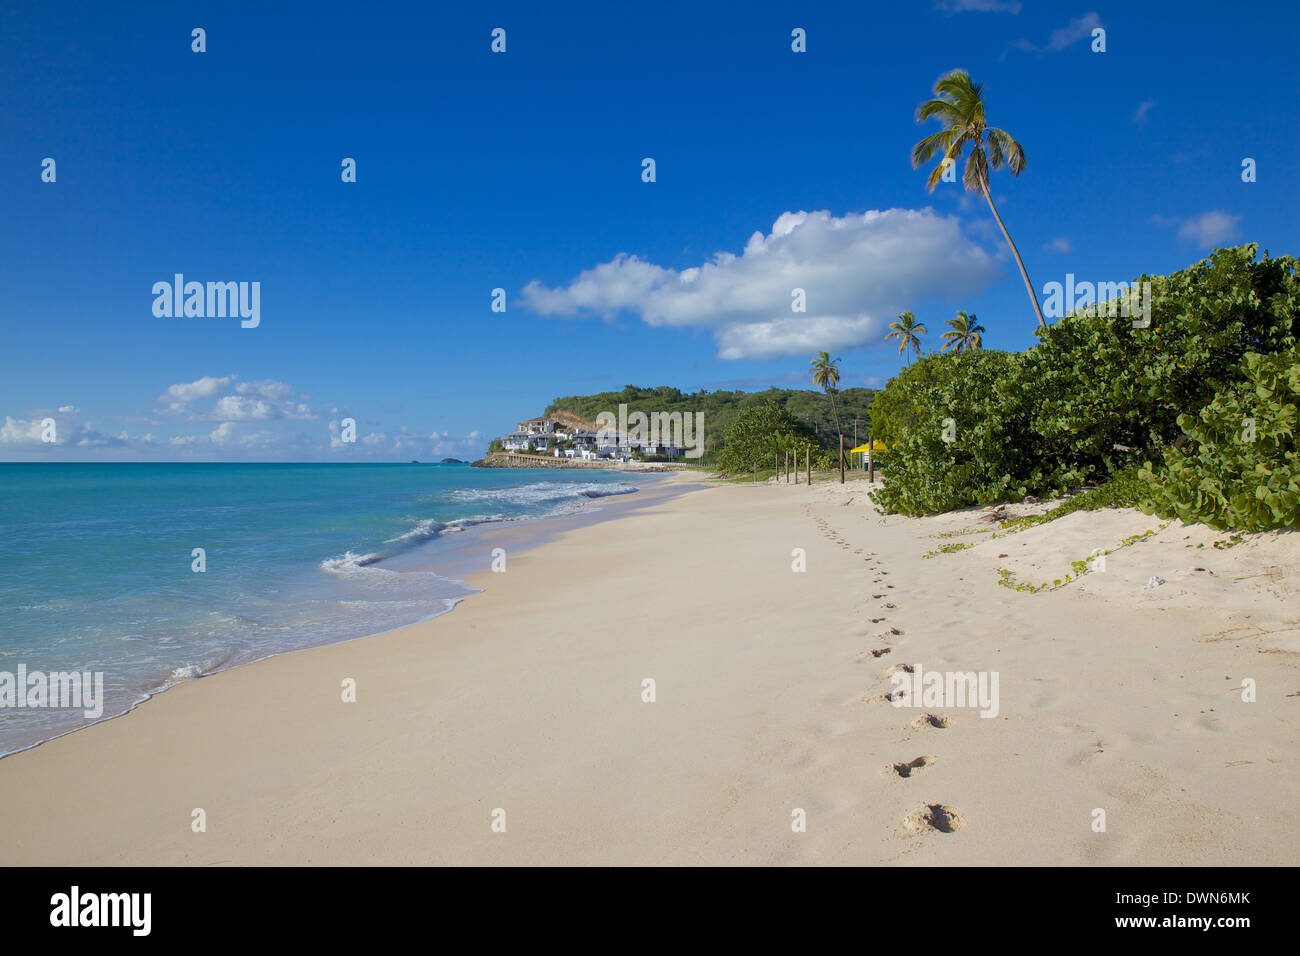 Darkwood Beach, St. Johns, Antigua, Leeward Islands, West Indies, Caribbean, Central America Stock Photo